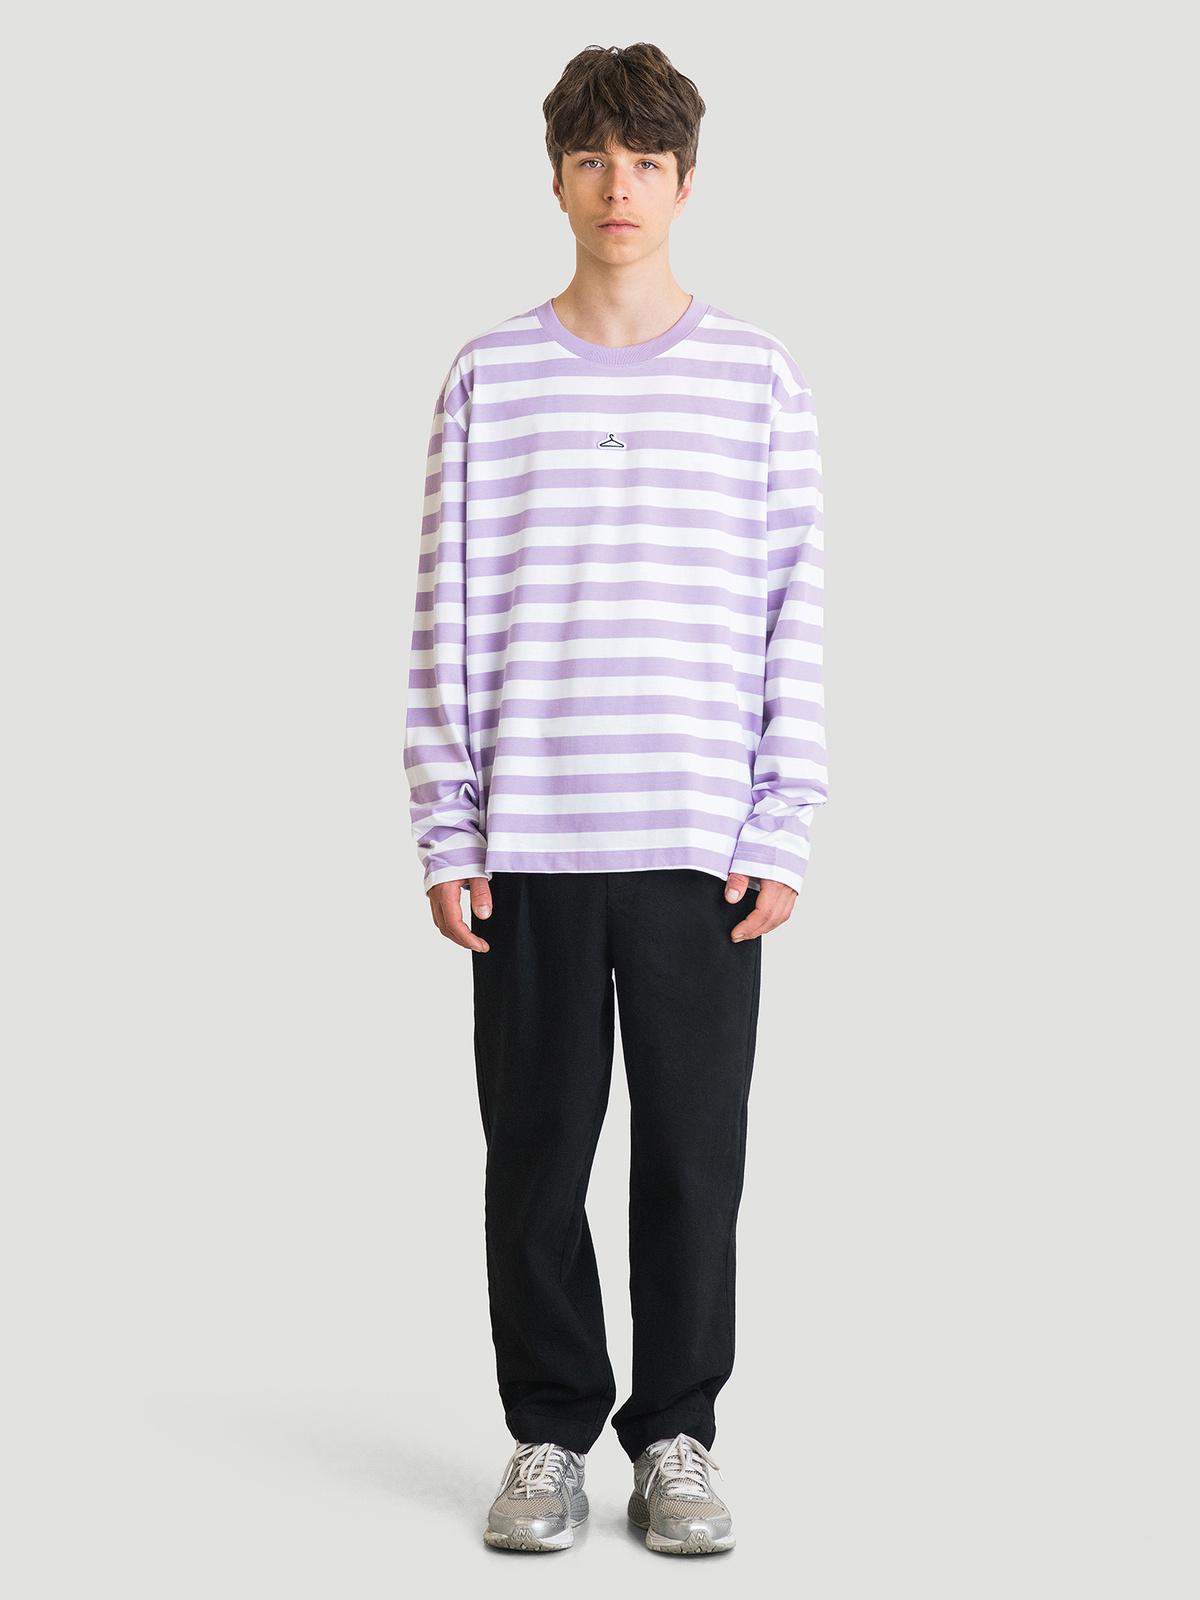 Hanger Striped Longsleeve Lilac White 8